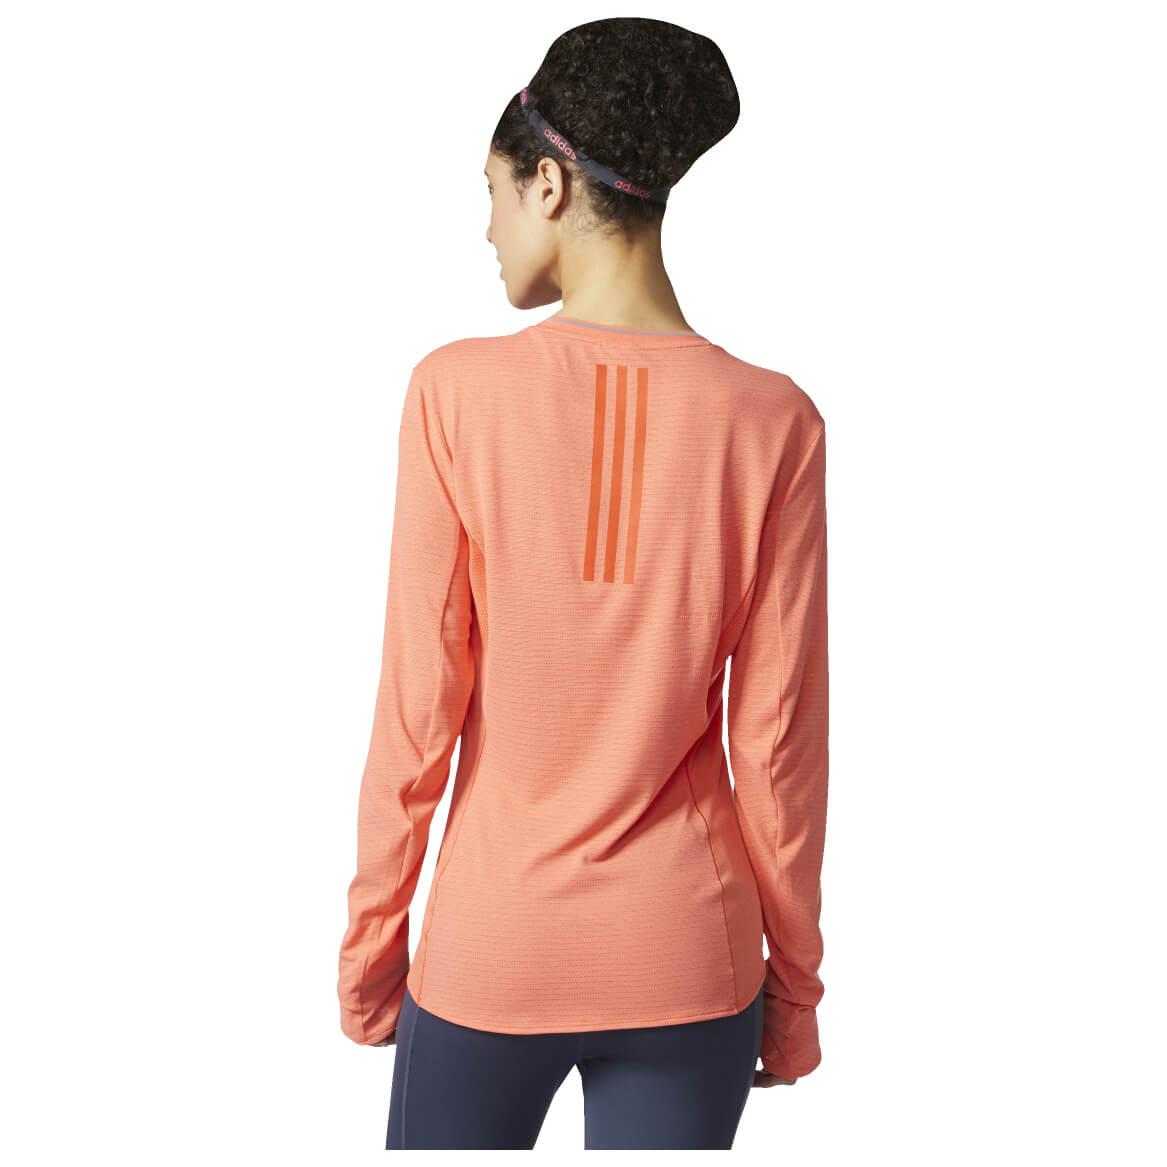 Adidas supernova long sleeve tee running shirt women 39 s for Long sleeve running shirt womens